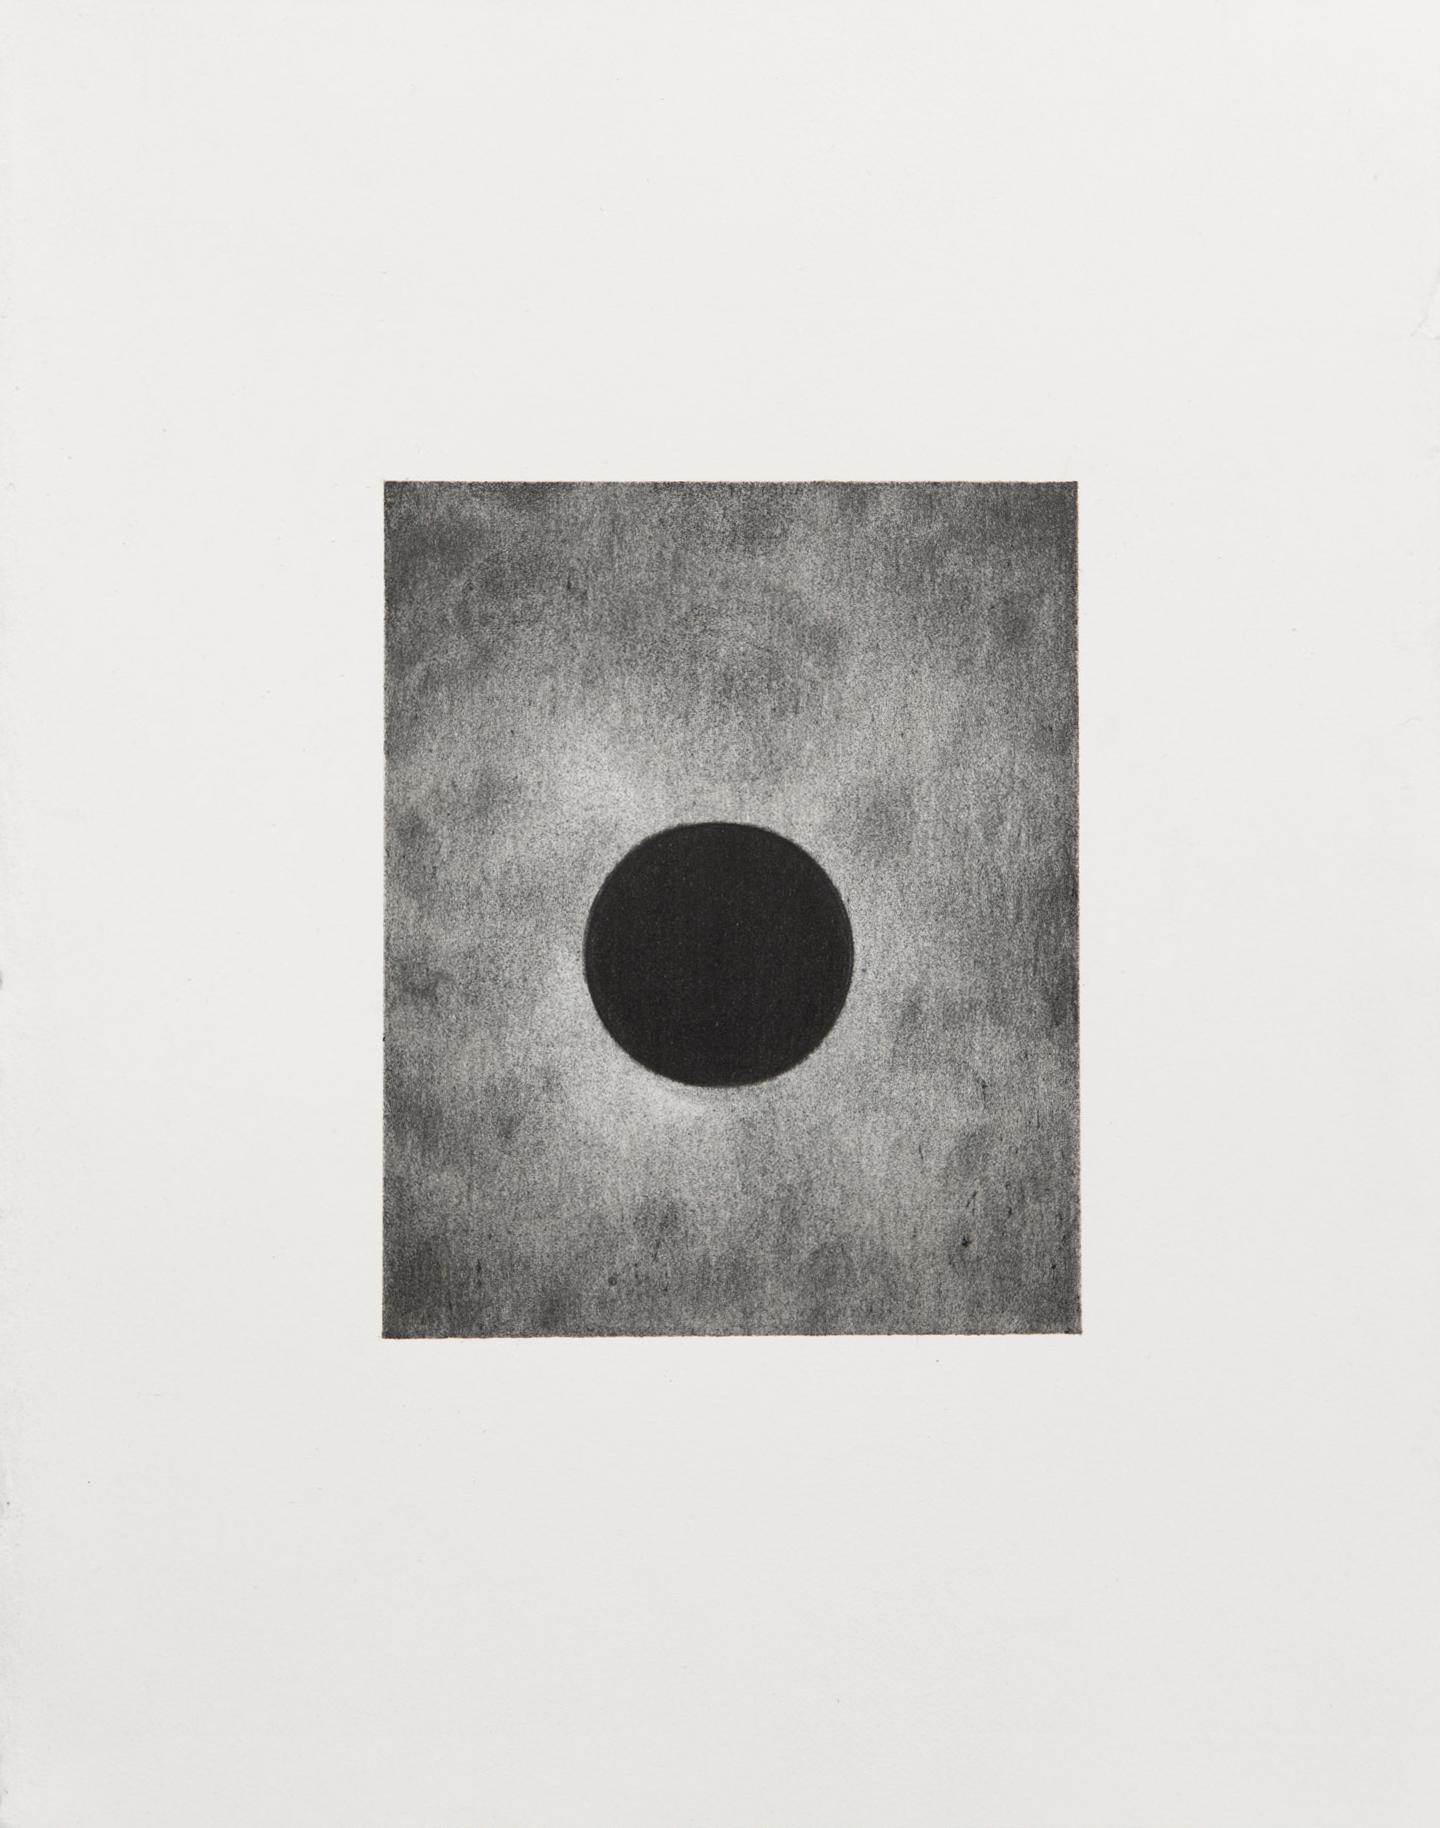 "Carl Trahan,  O   1,  2018, graphite sur papier, 12 x 10 cm (5"" x 4"")"